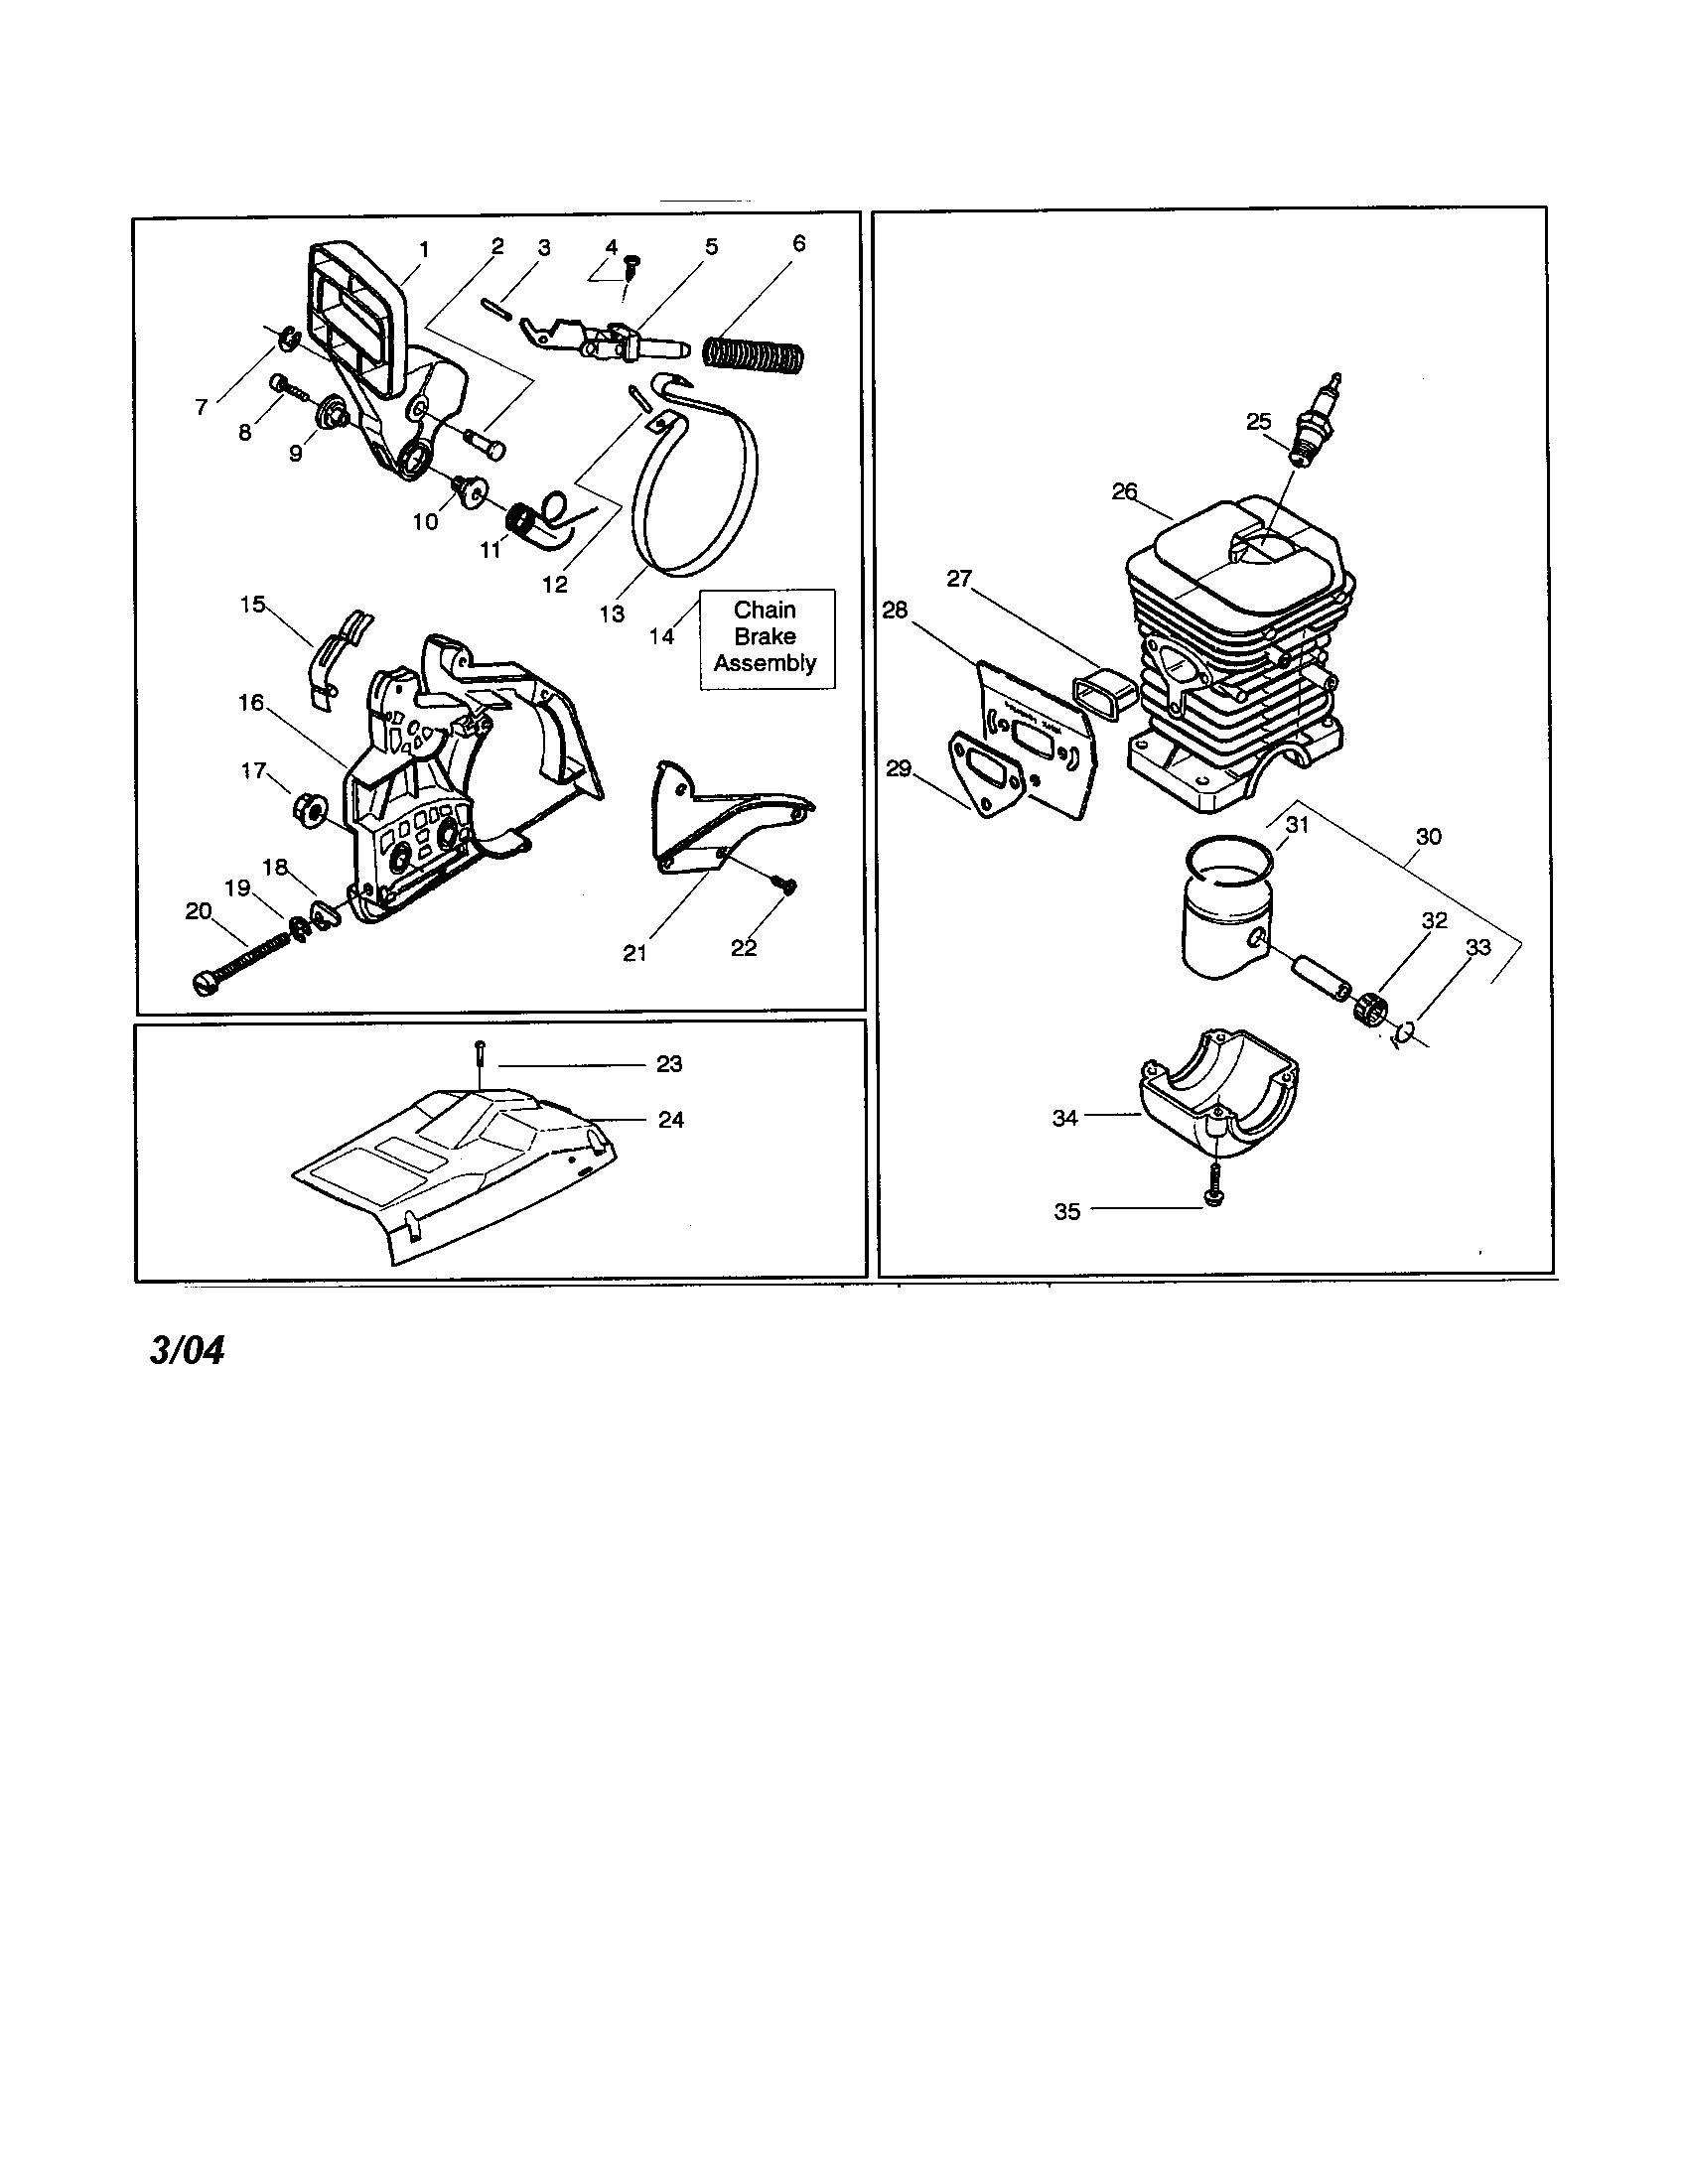 husqvarna 136 chainsaw service manual